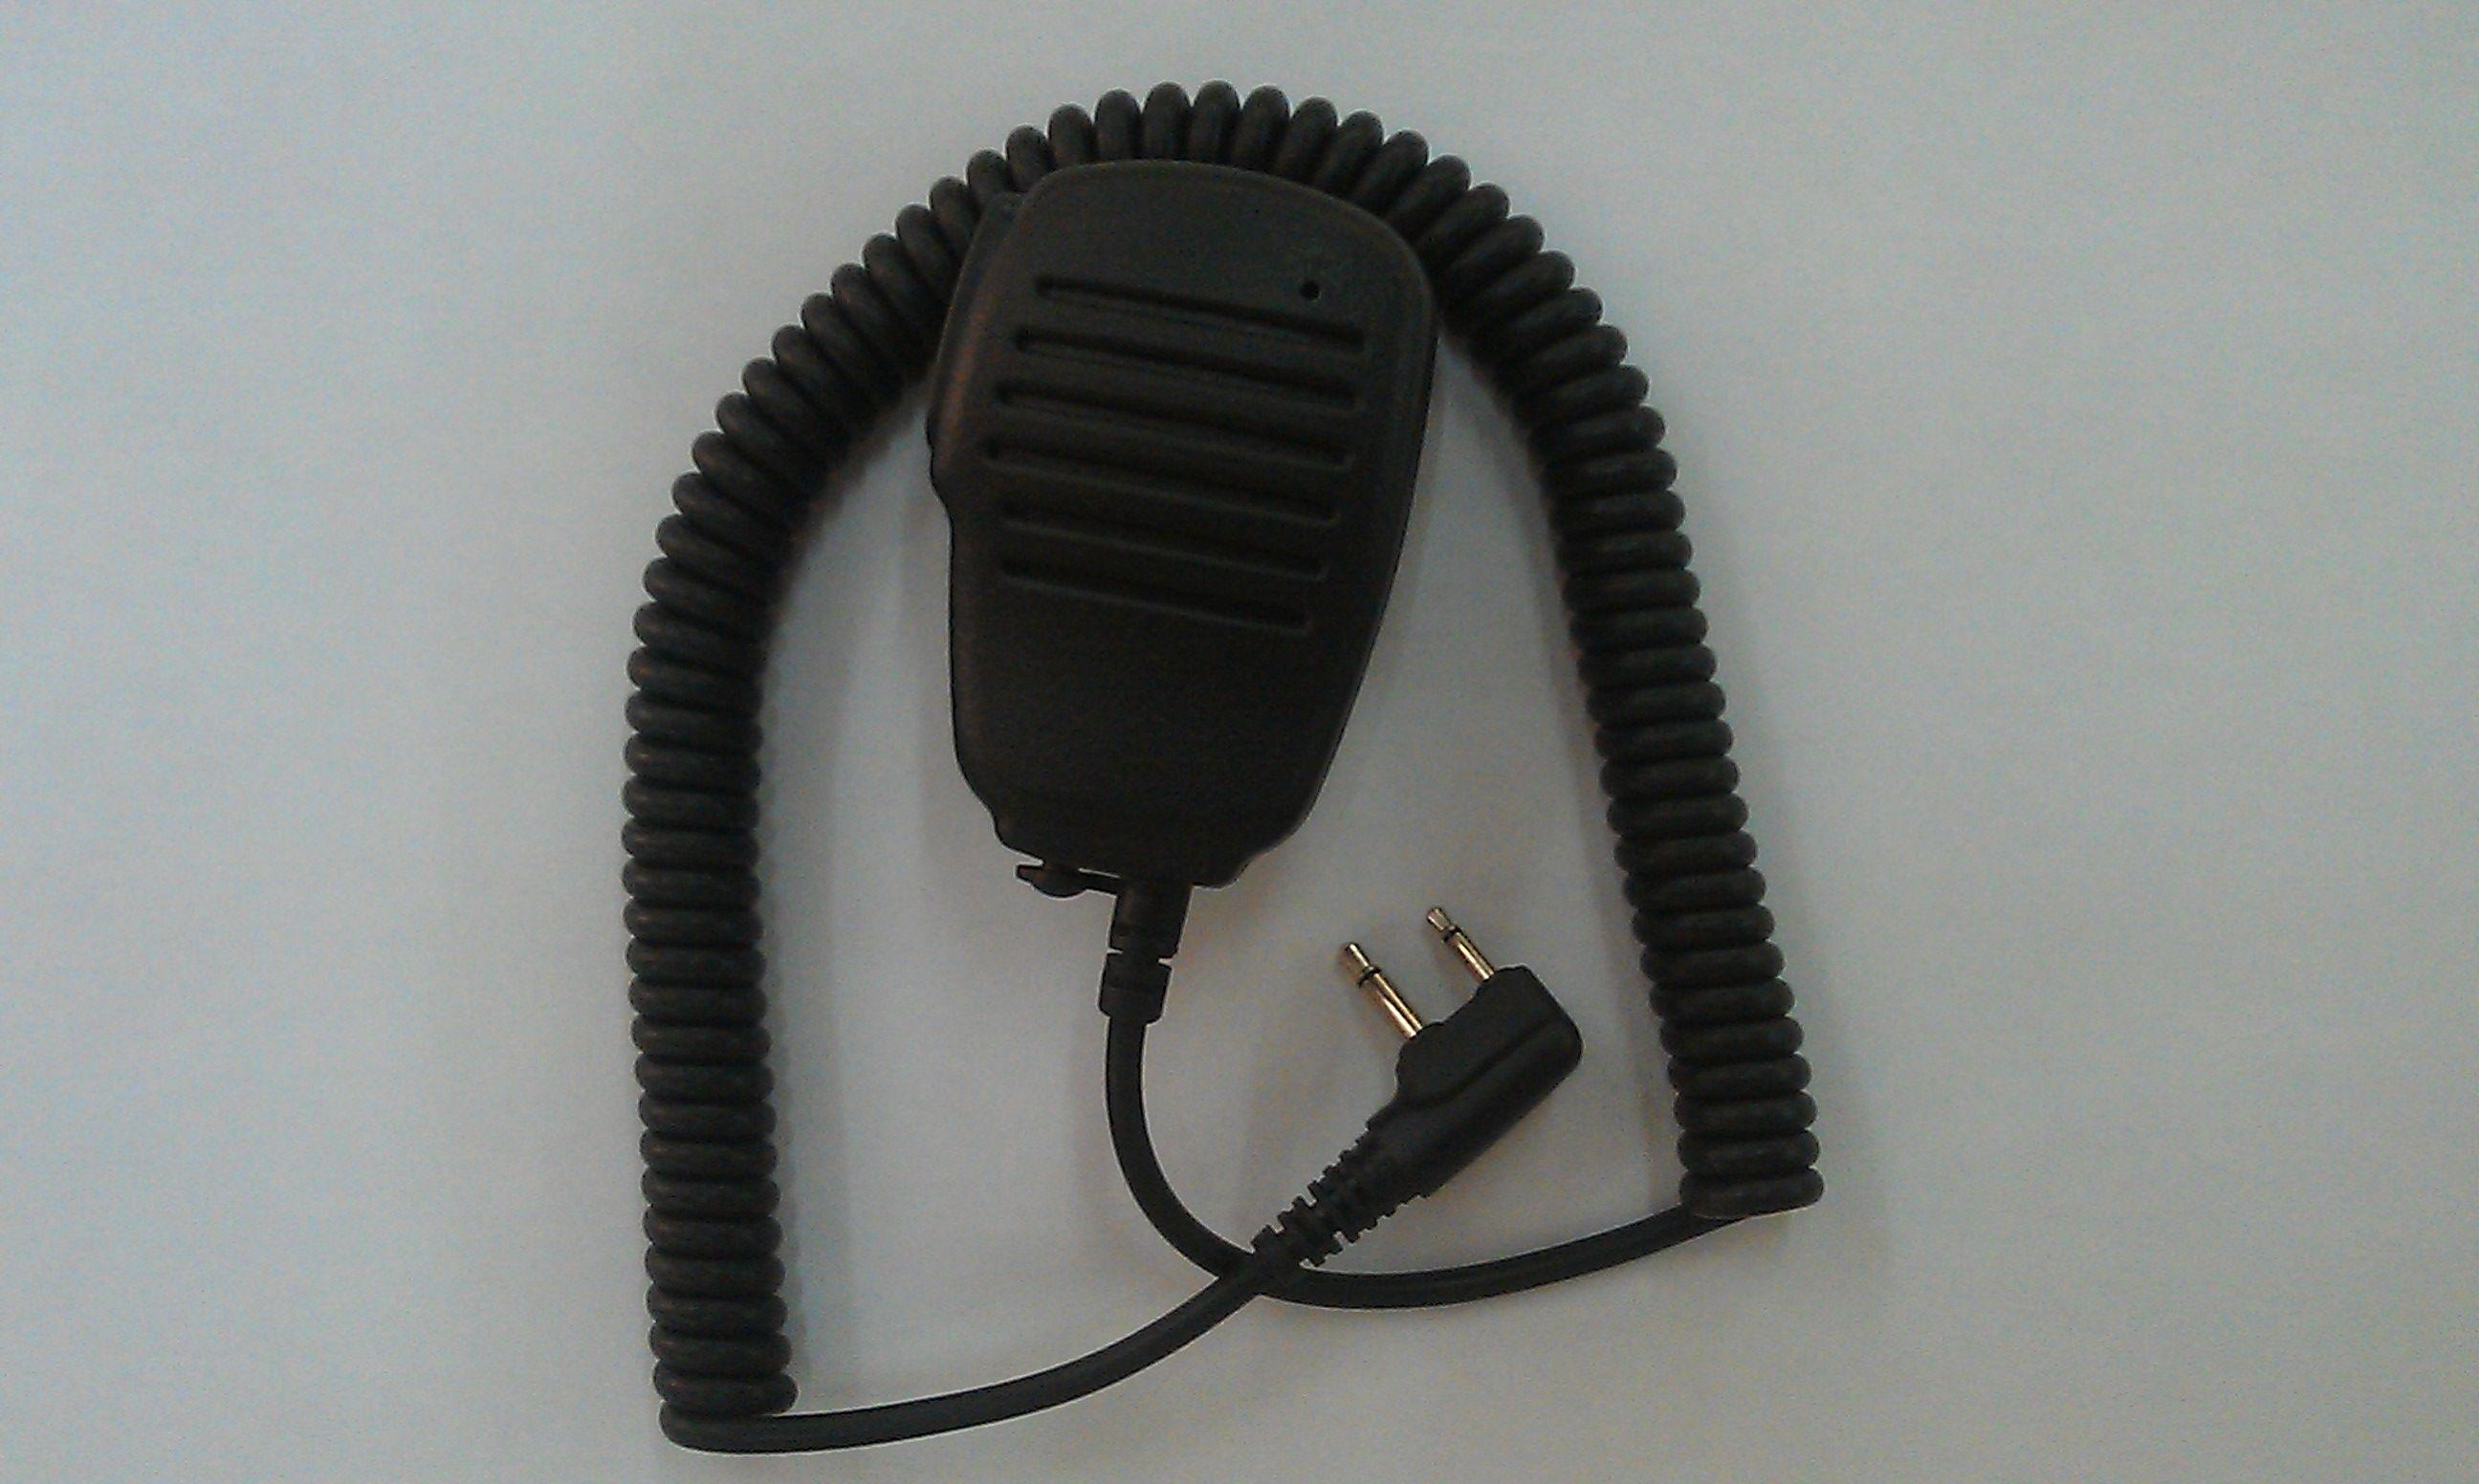 MICRO-ALTAVOZ: Catálogo de Olanni Electronics